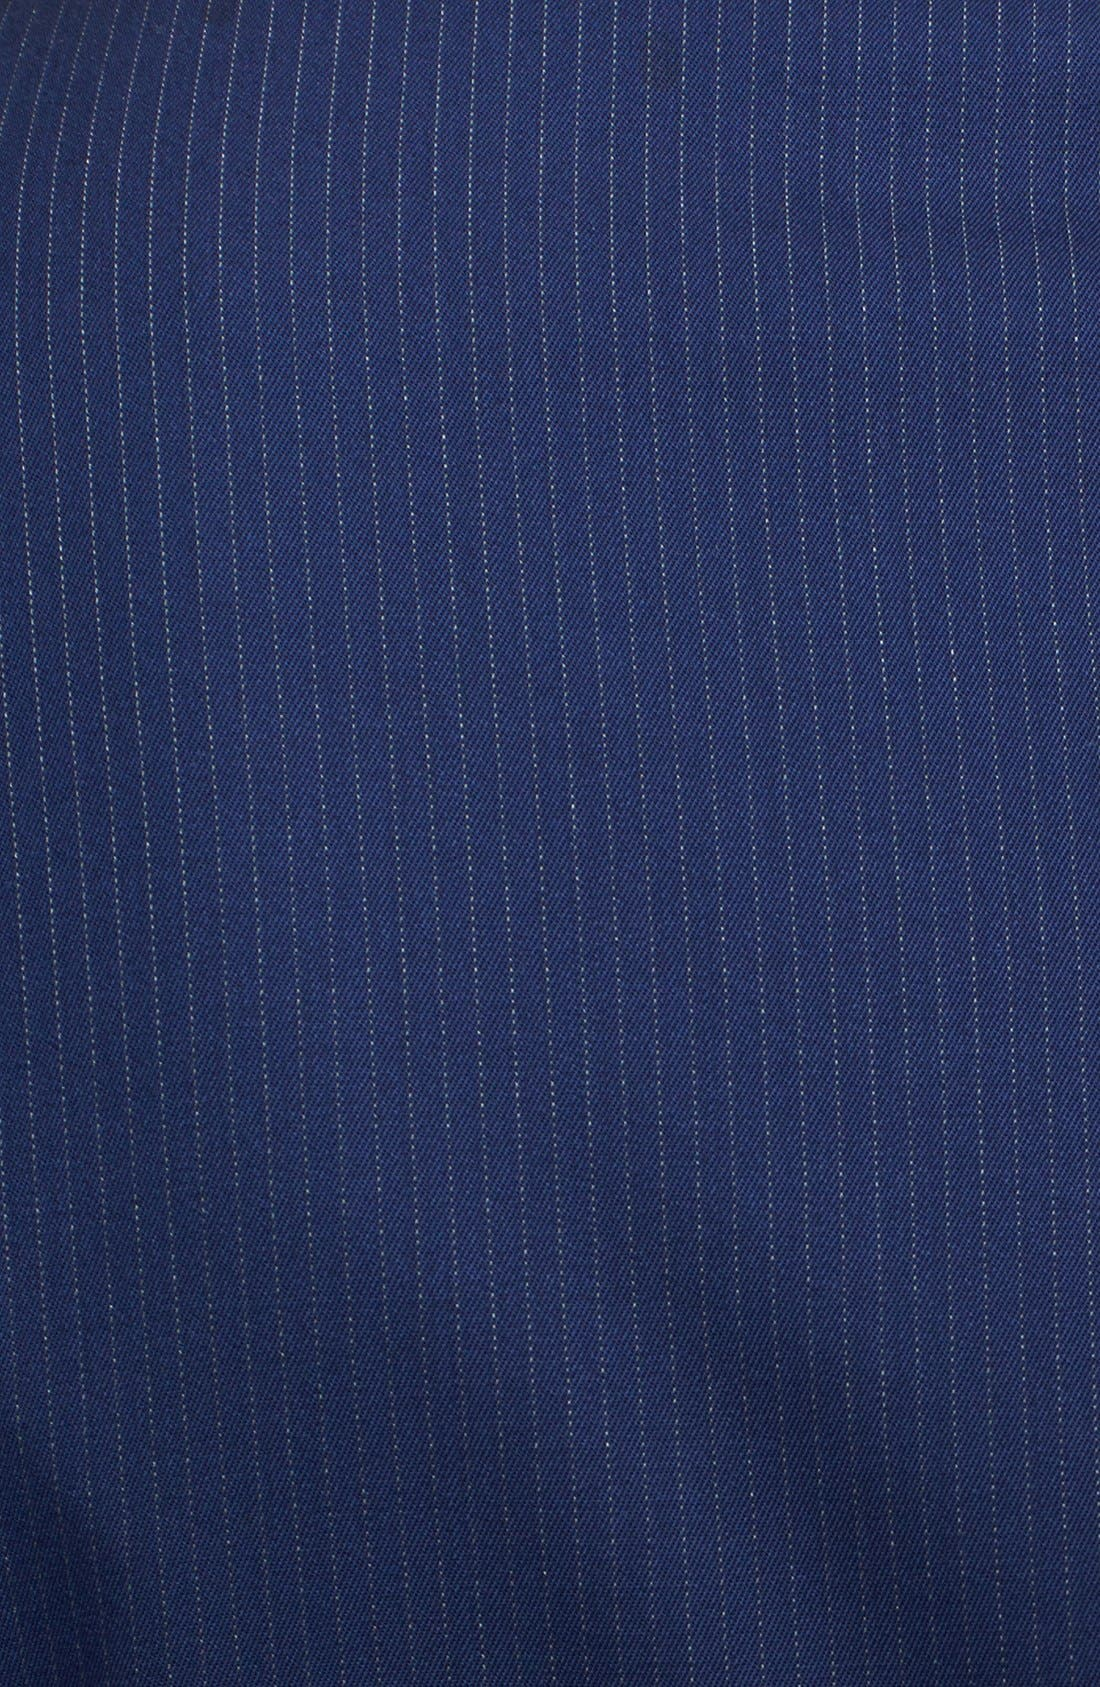 Alternate Image 6  - Ralph Lauren Black Label Twill Wool Suit